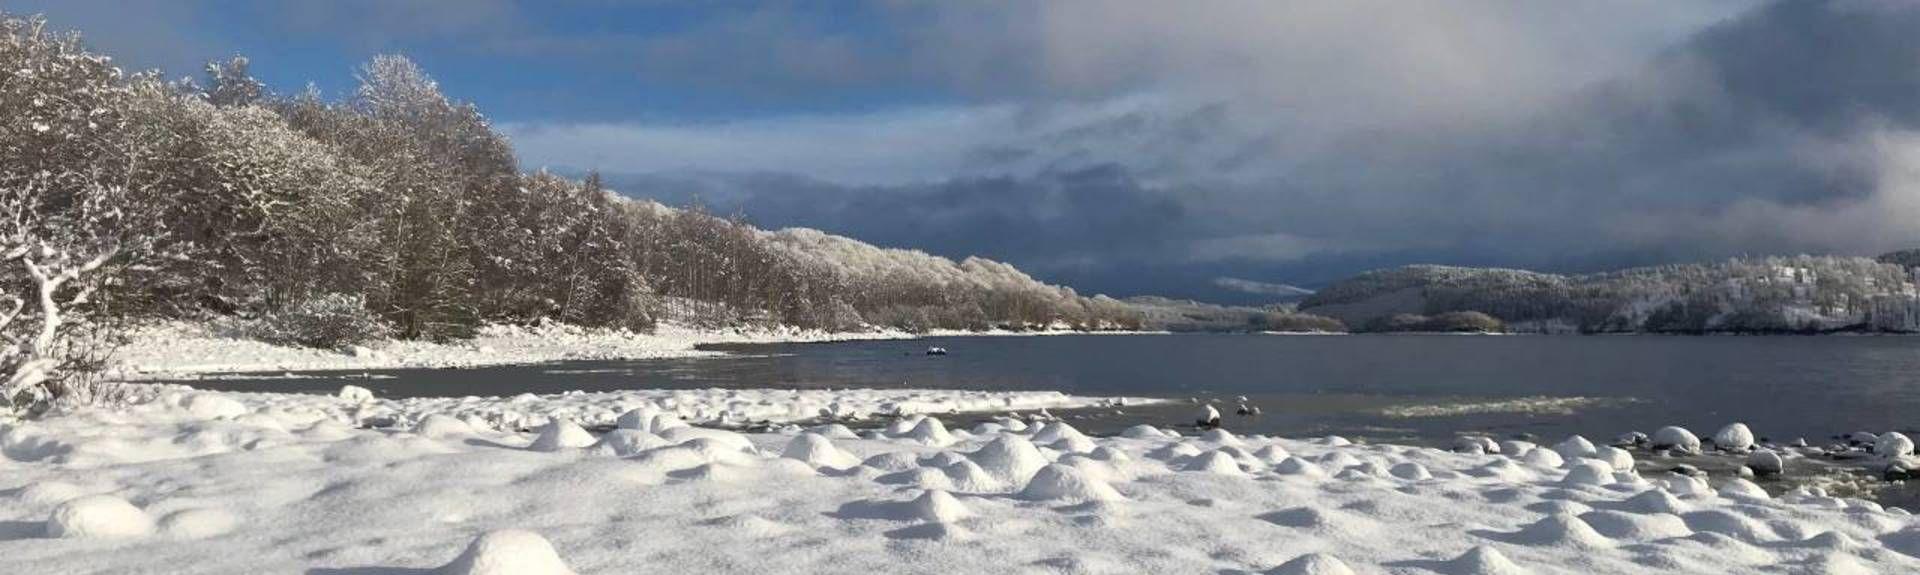 Fort Augustus, Scottish Highlands, Scotland, UK